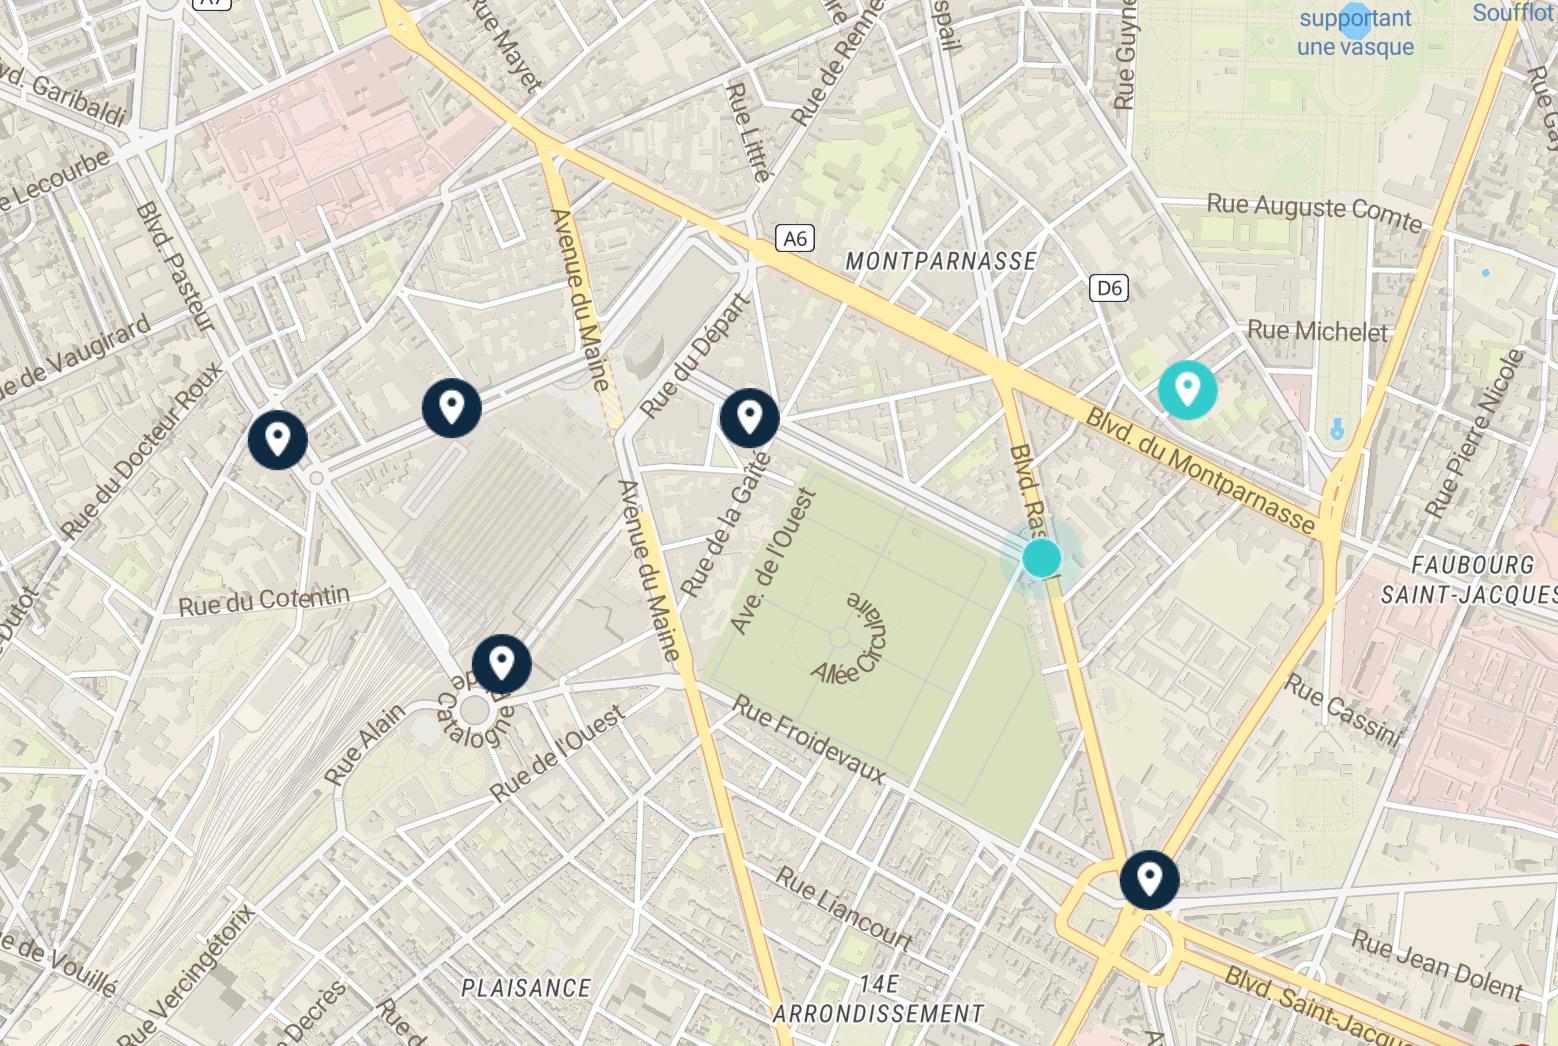 montparnasse map luggage storage points